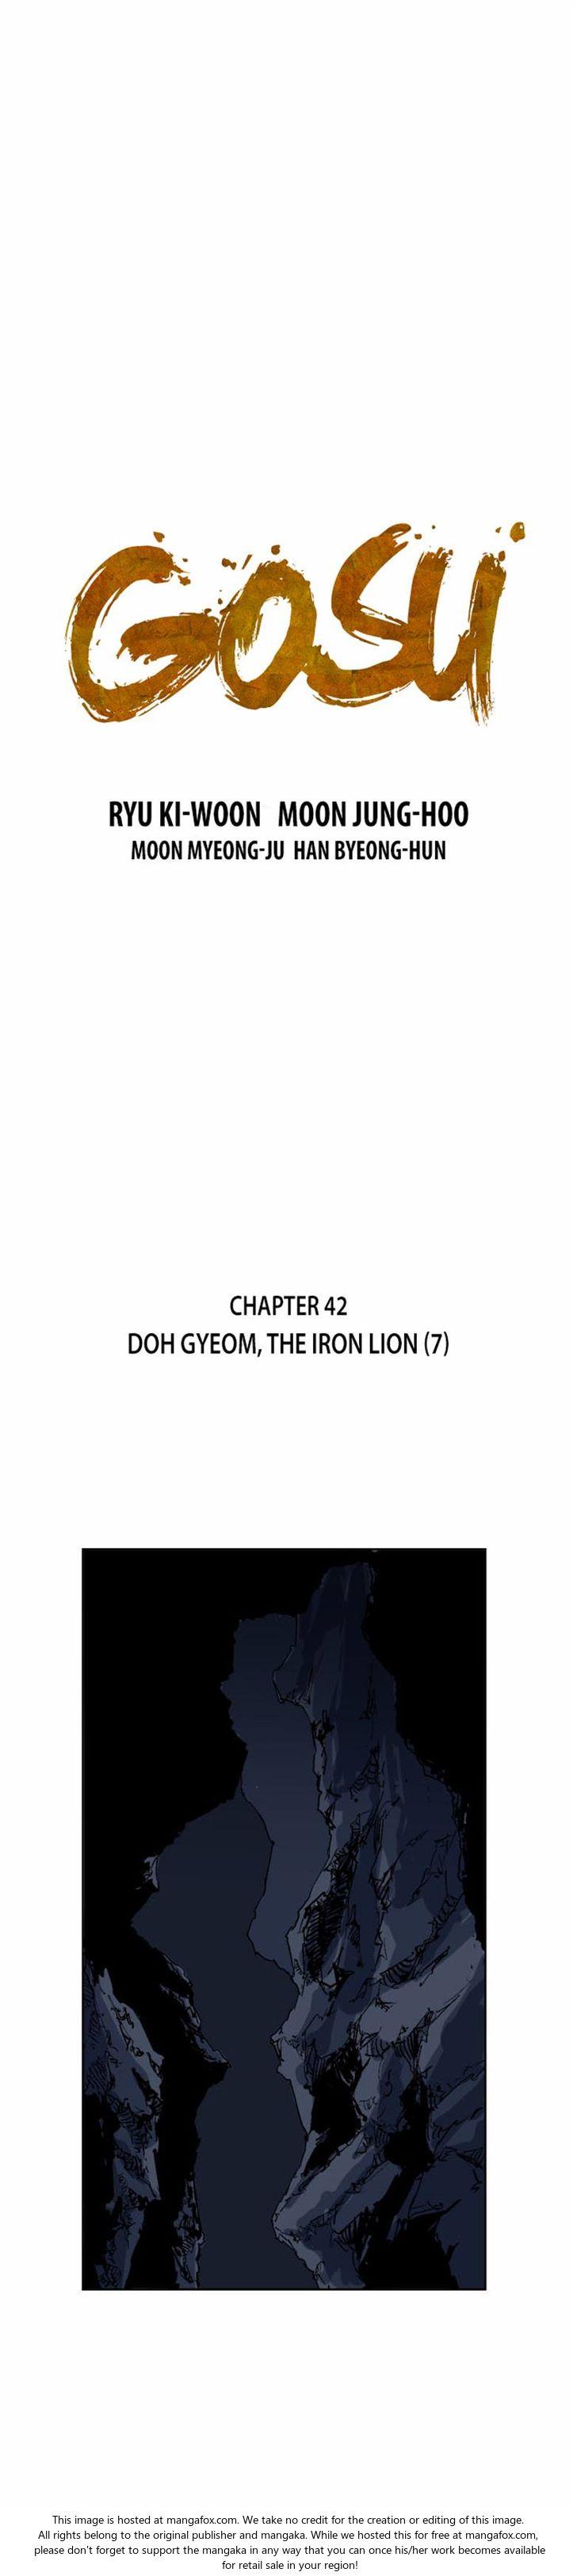 Gosu 42: Doh Gyeom, the Iron Lion (7) at MangaFox.la